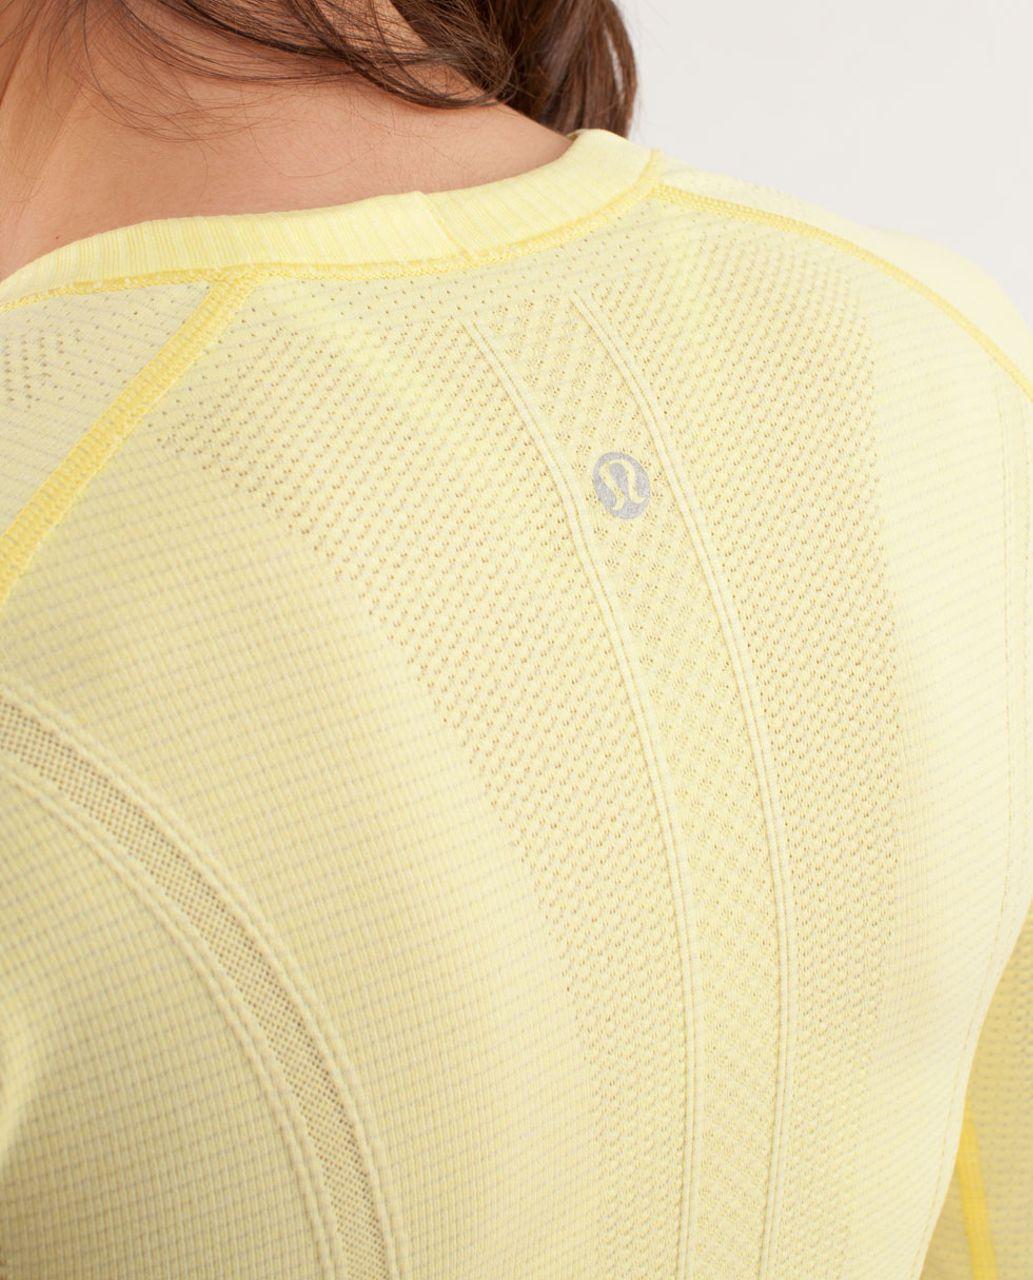 Lululemon Run:  Swiftly Tech Long Sleeve - Mellow Lemon